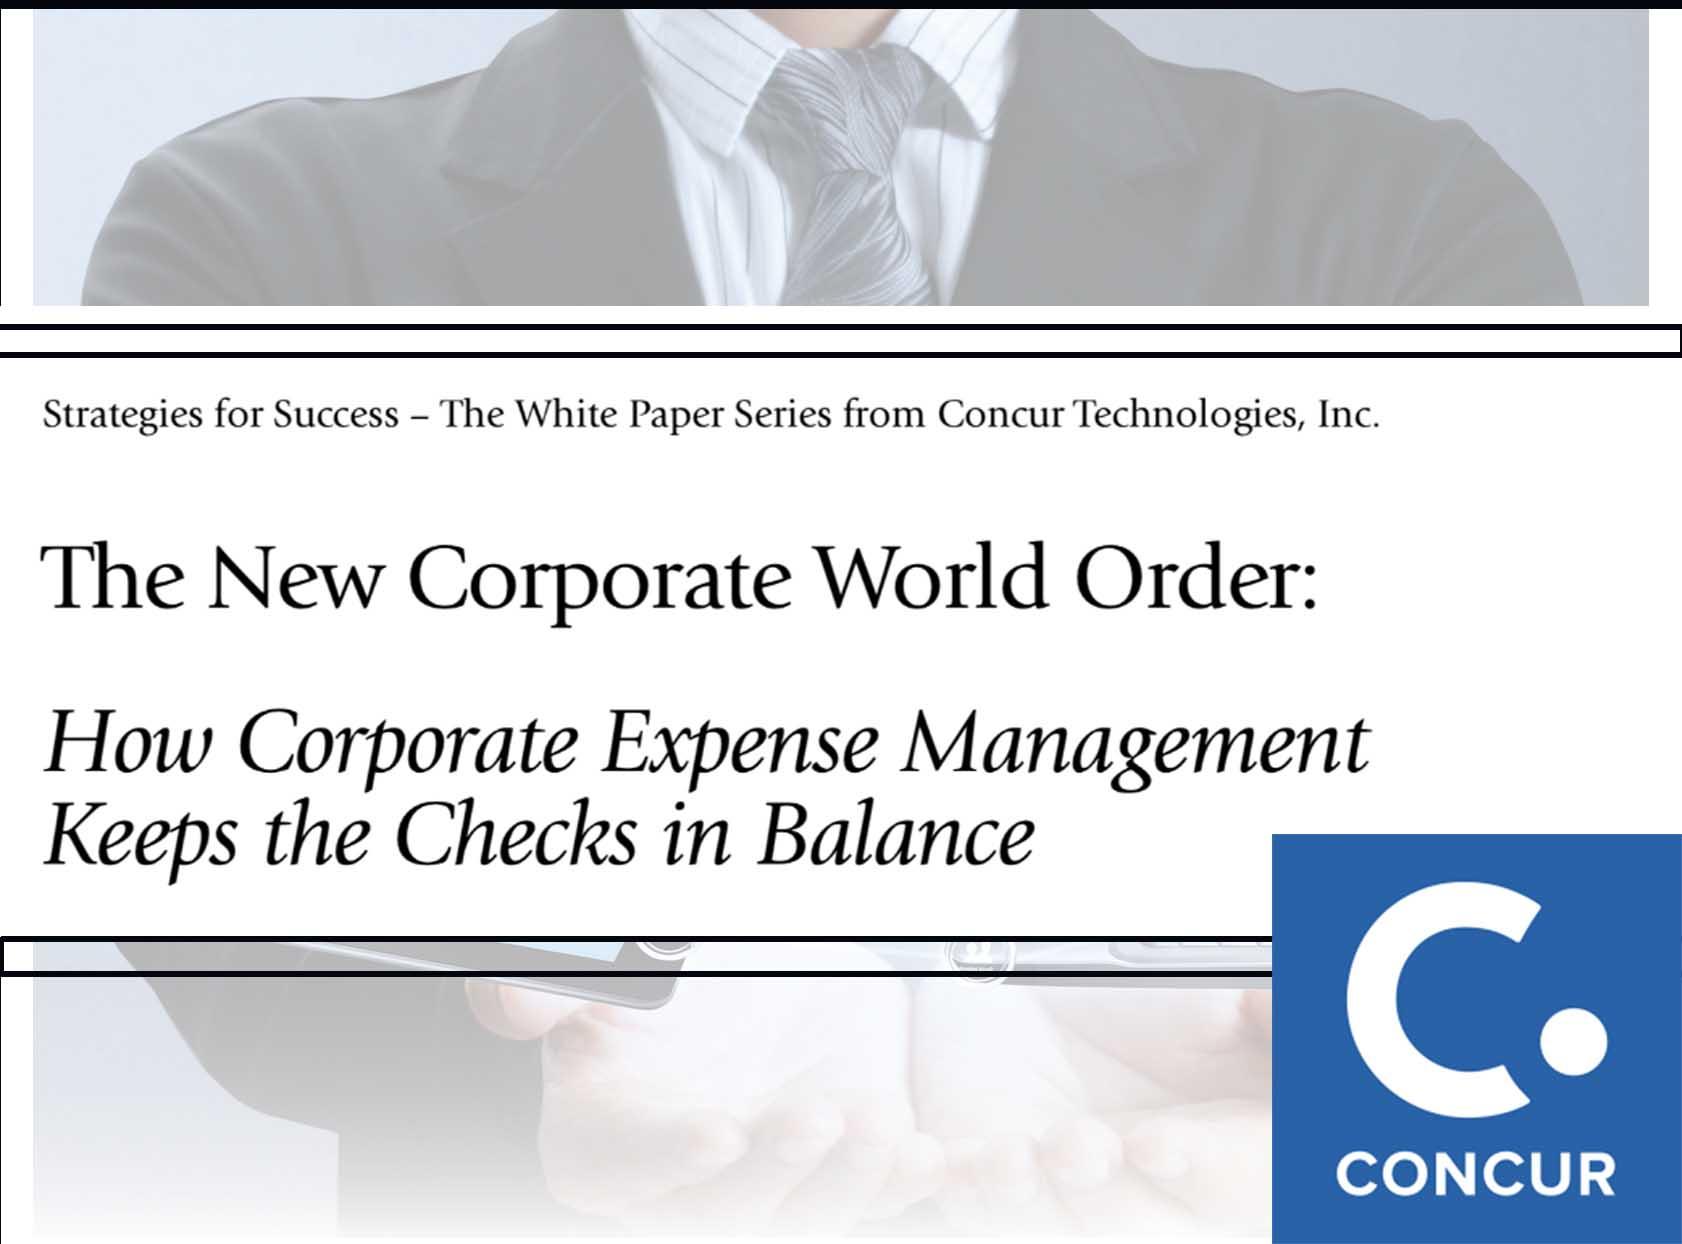 concur - WHITE PAPER